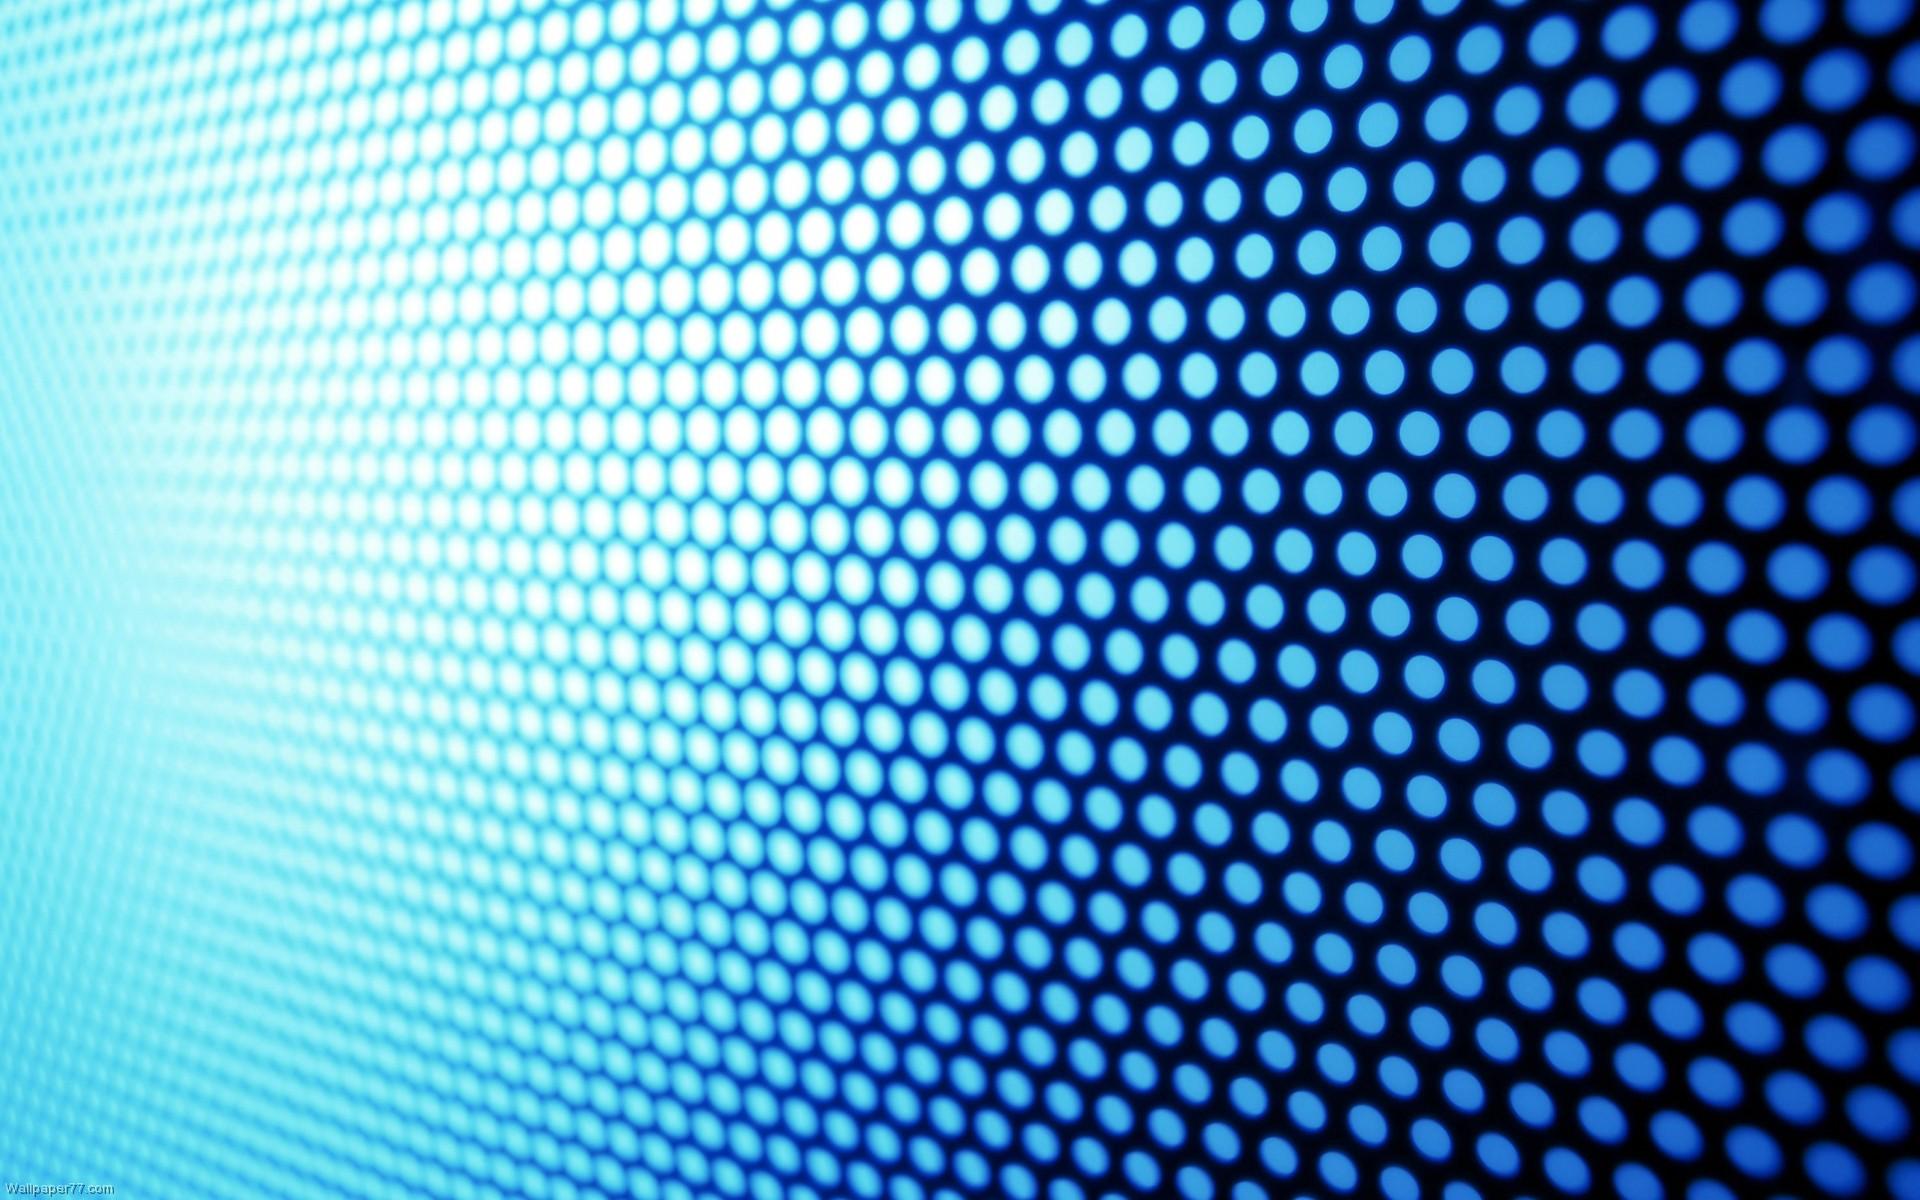 Blue-Carbon-Fiber-HD-PixelsTalk-Net-wallpaper-wpc5802921